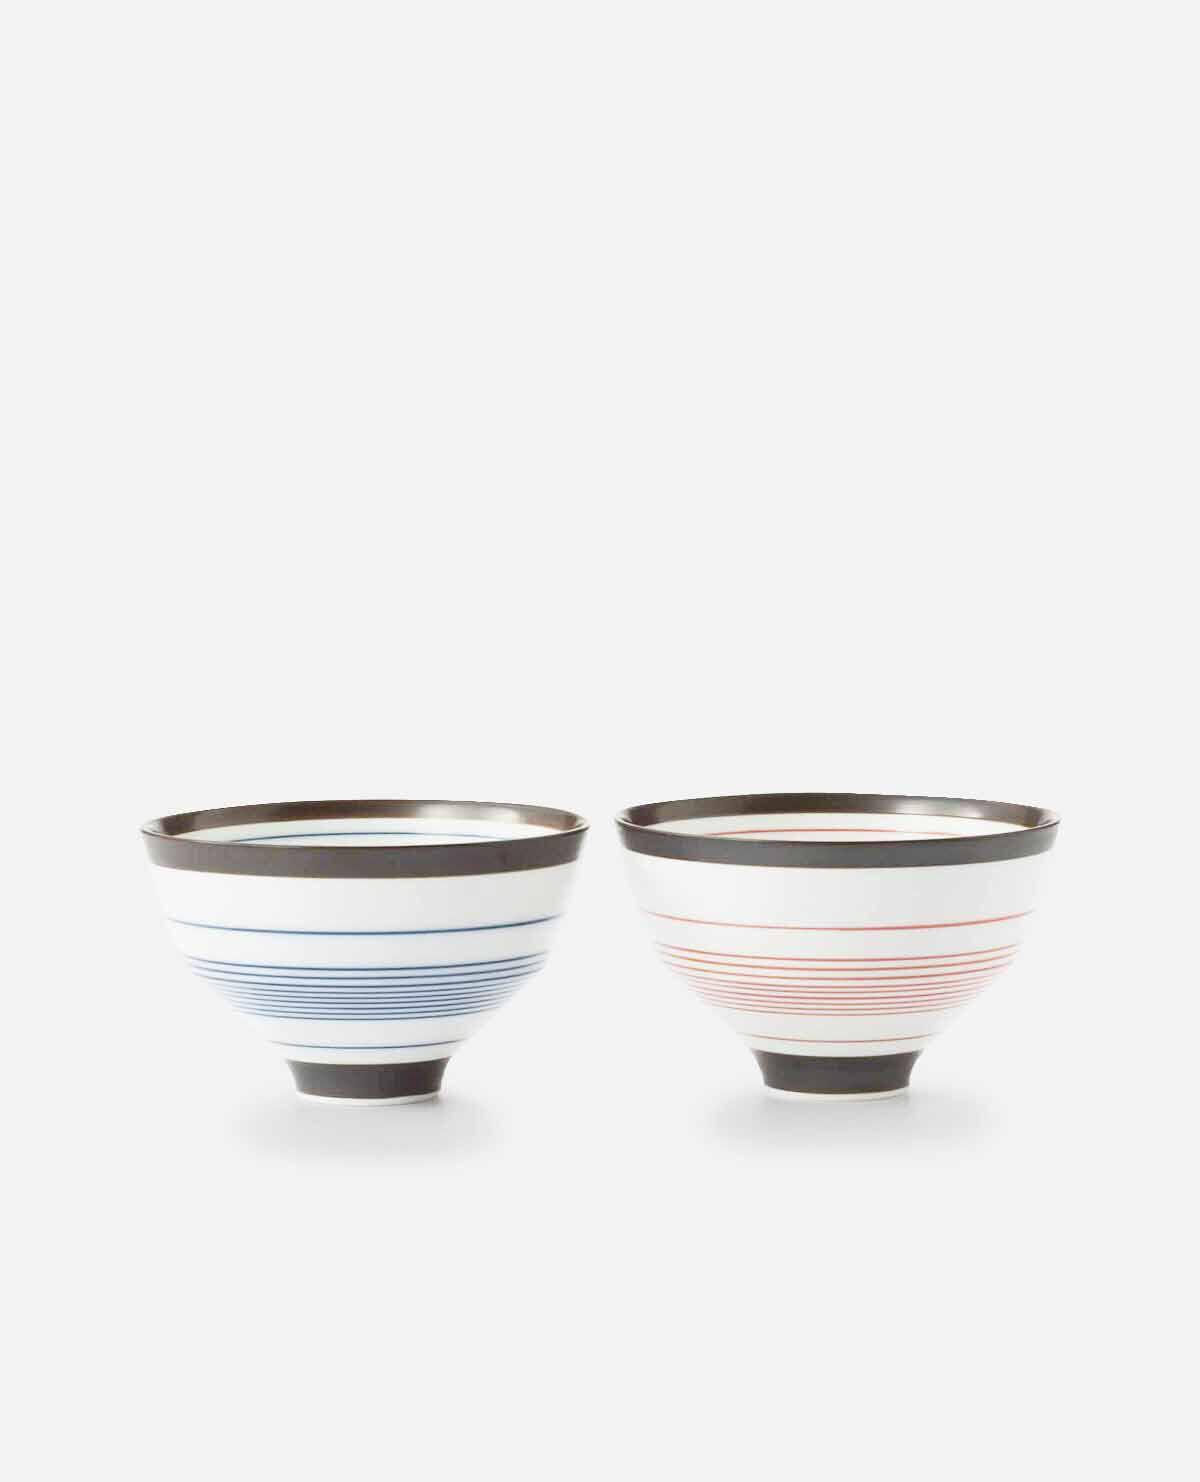 段付飯碗2個セット 呉須錆線紋(茶碗)